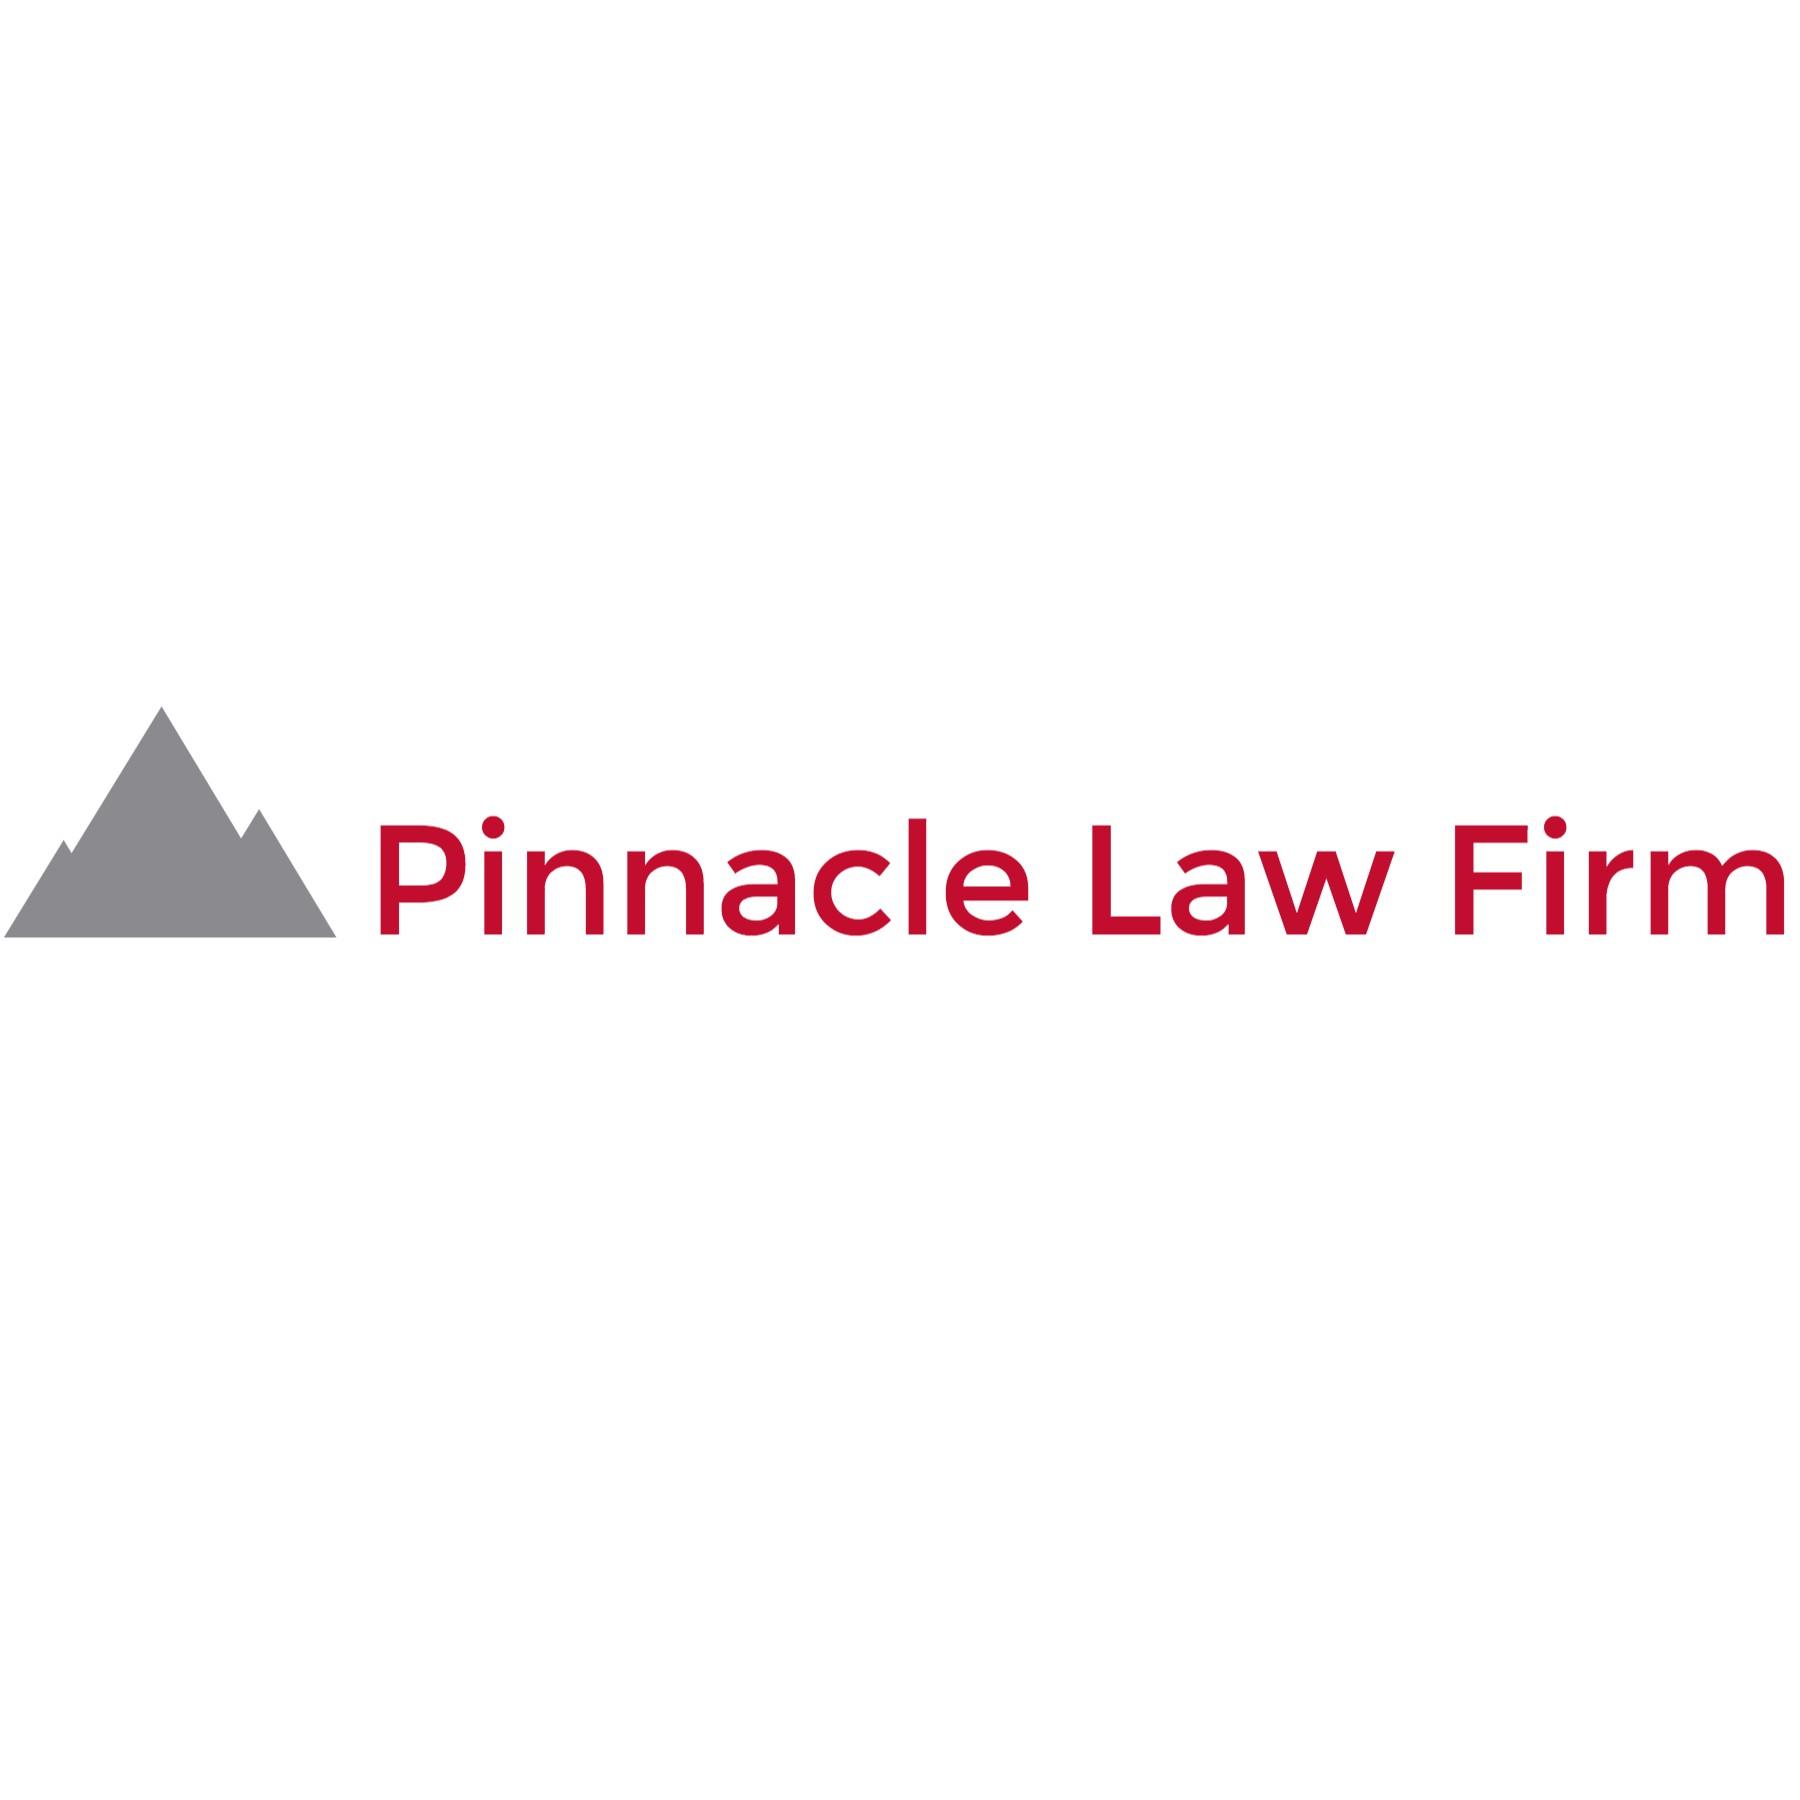 Pinnacle Law Firm - Woodland Hills, CA 91364 - (818)483-0424   ShowMeLocal.com